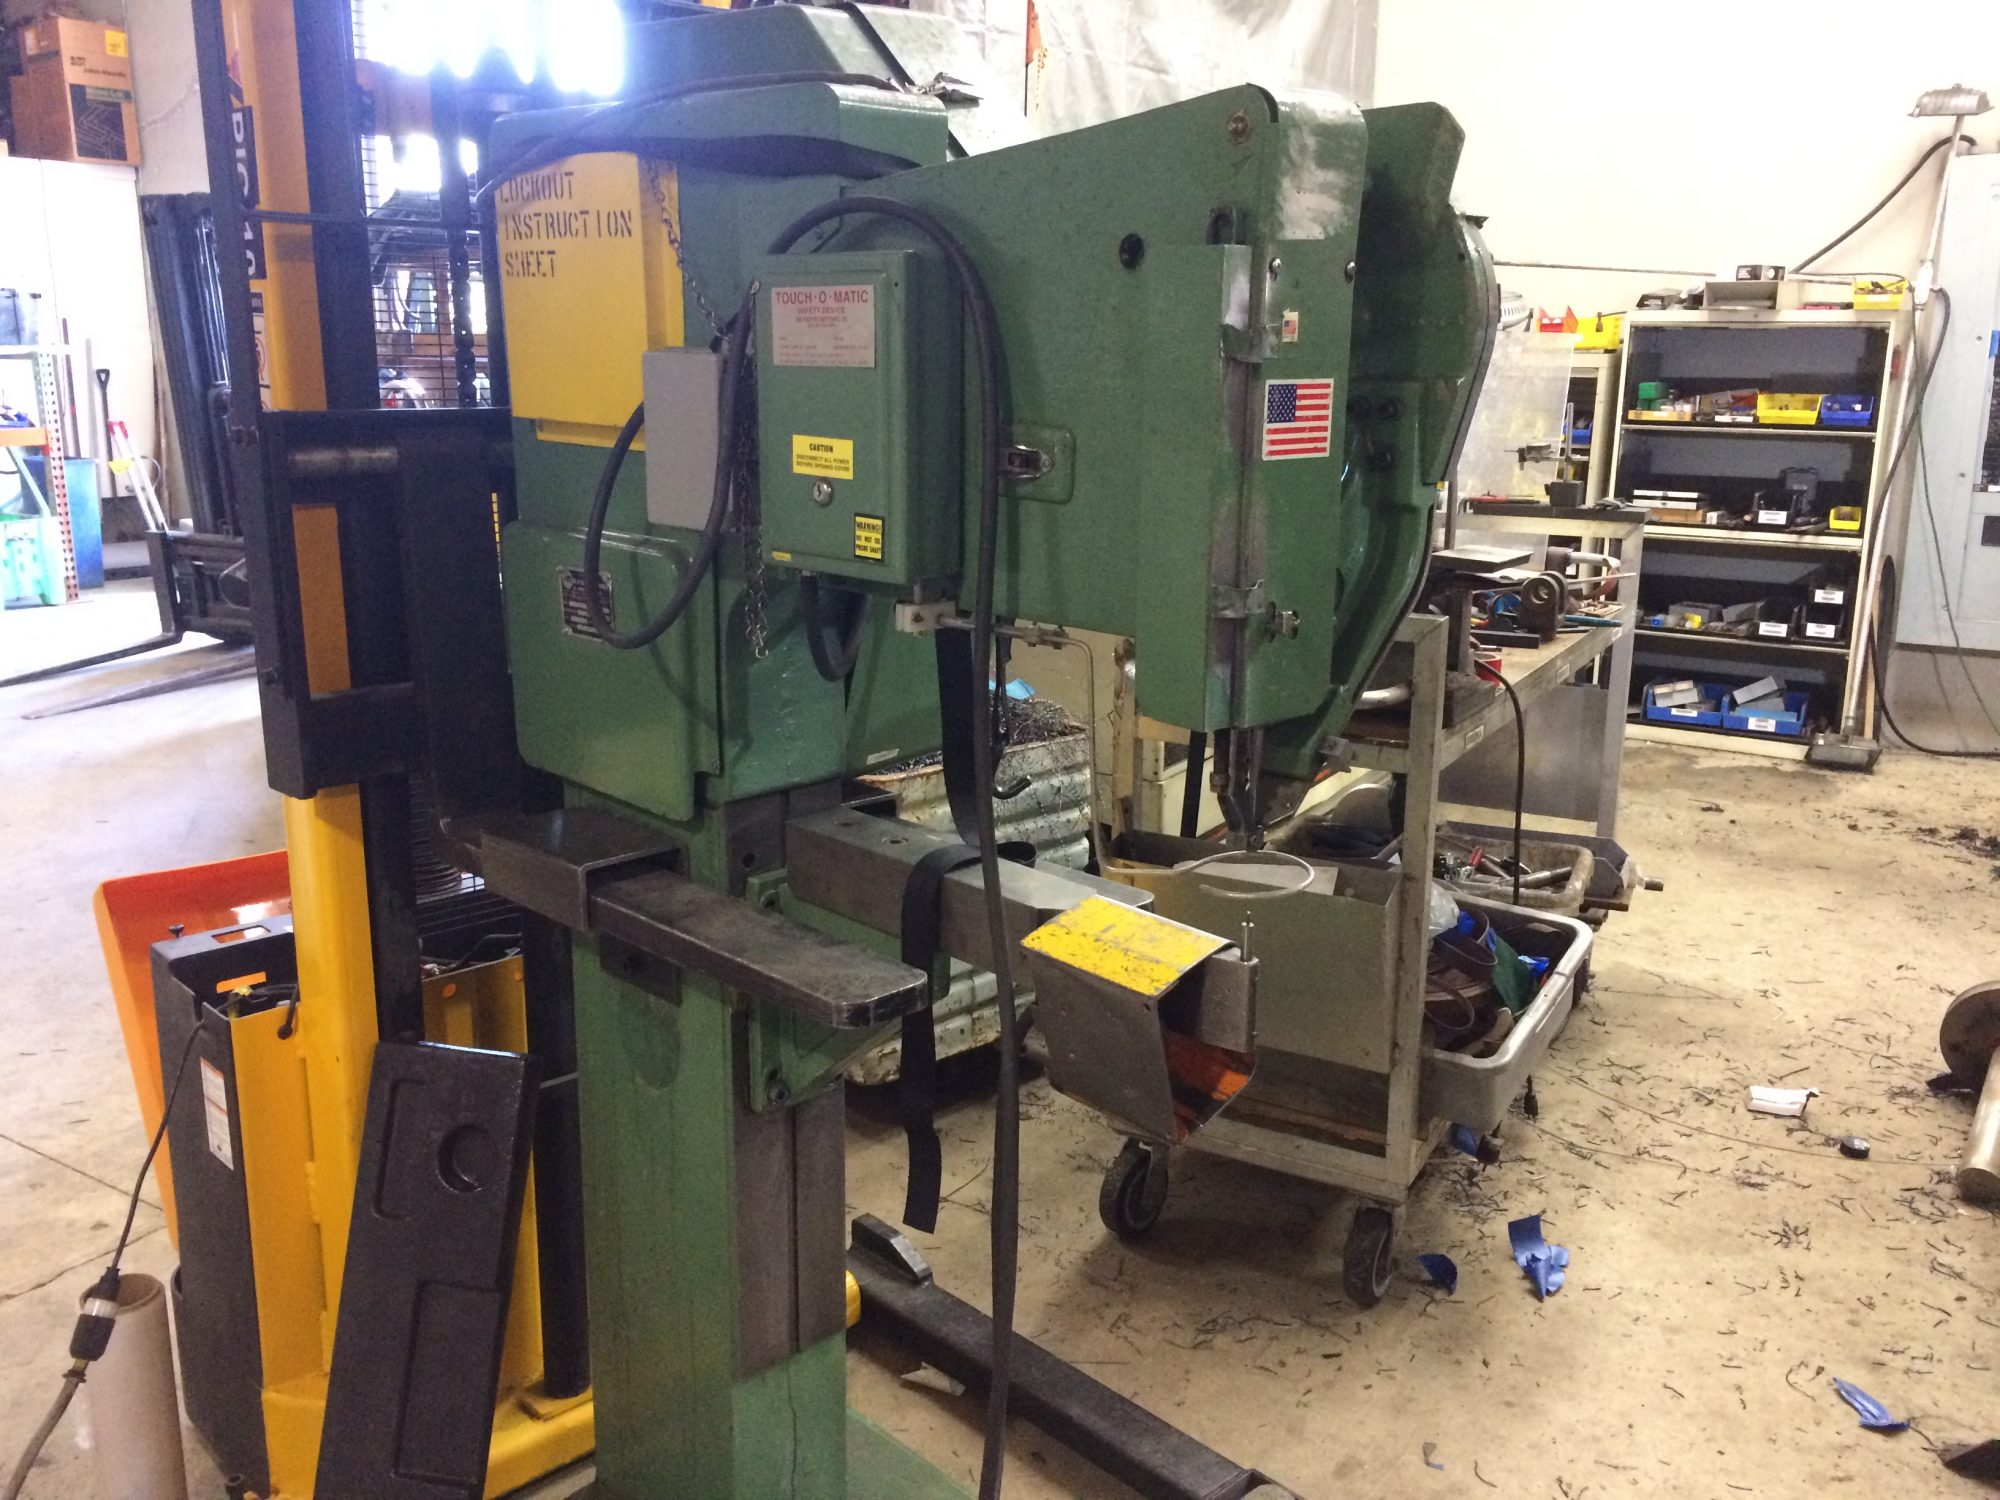 Milford Rivet & Machine CO. Model S-3-24-500 Serial 1851 Tooled for Rivet 511 X 125